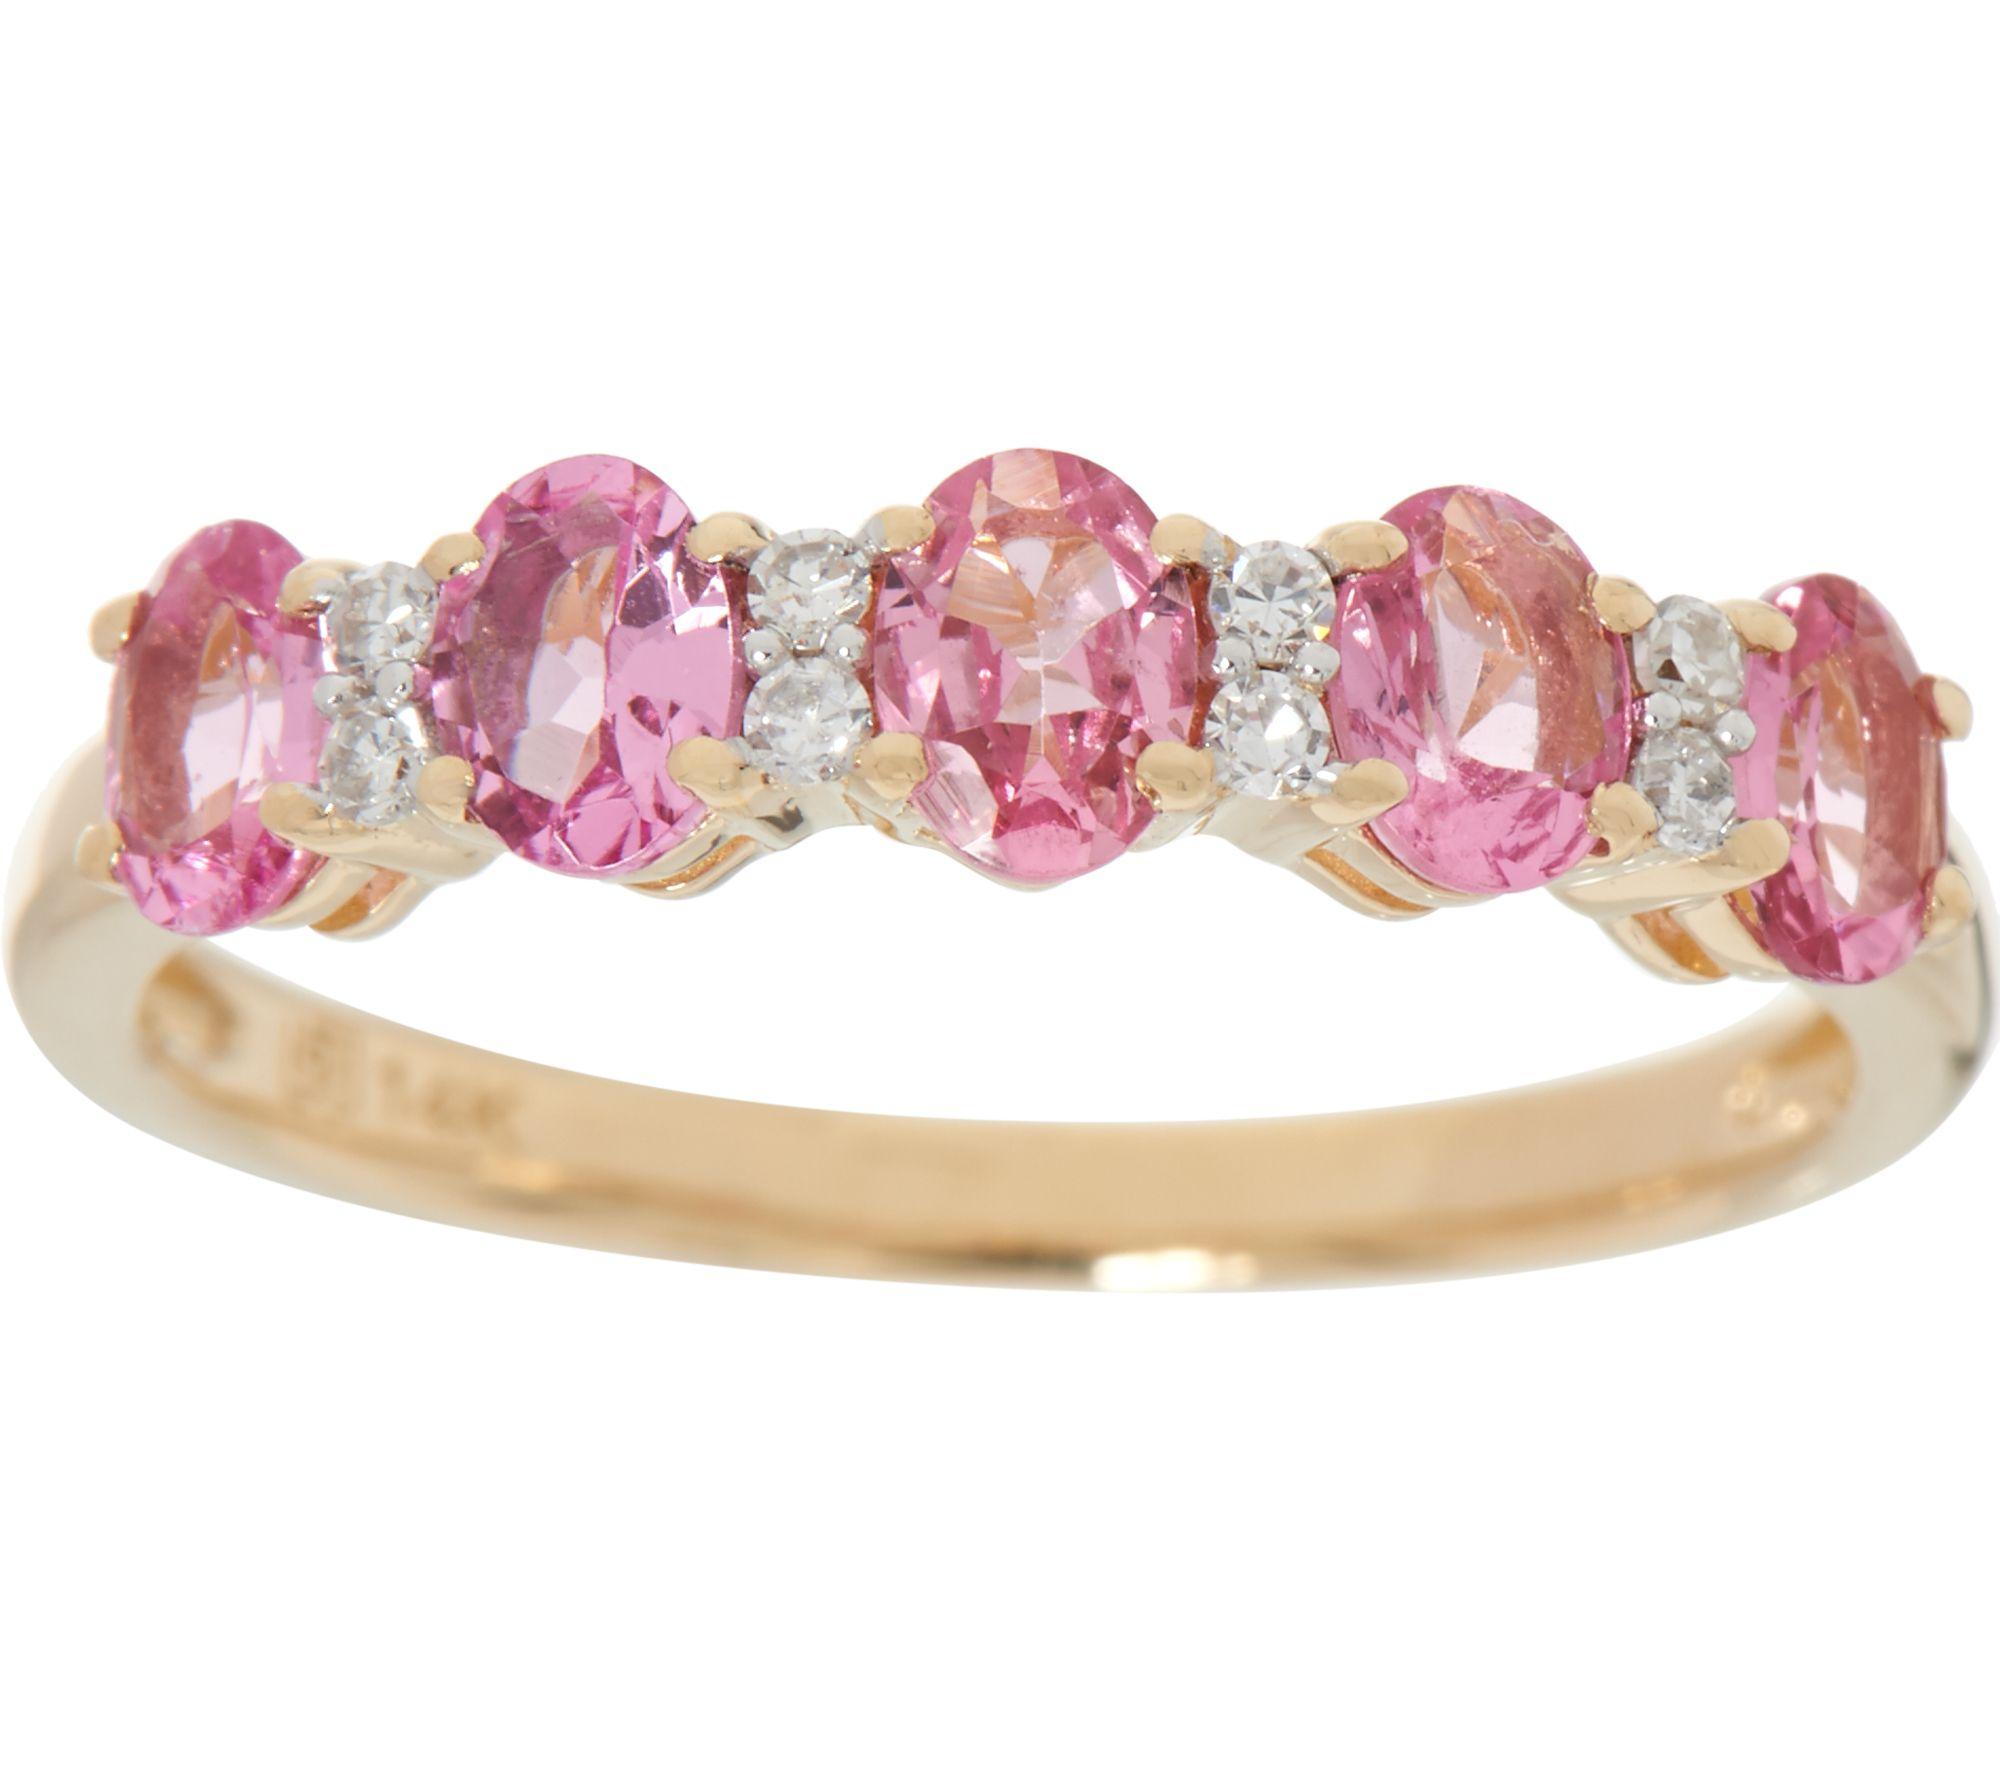 Clearance Diamond Rings